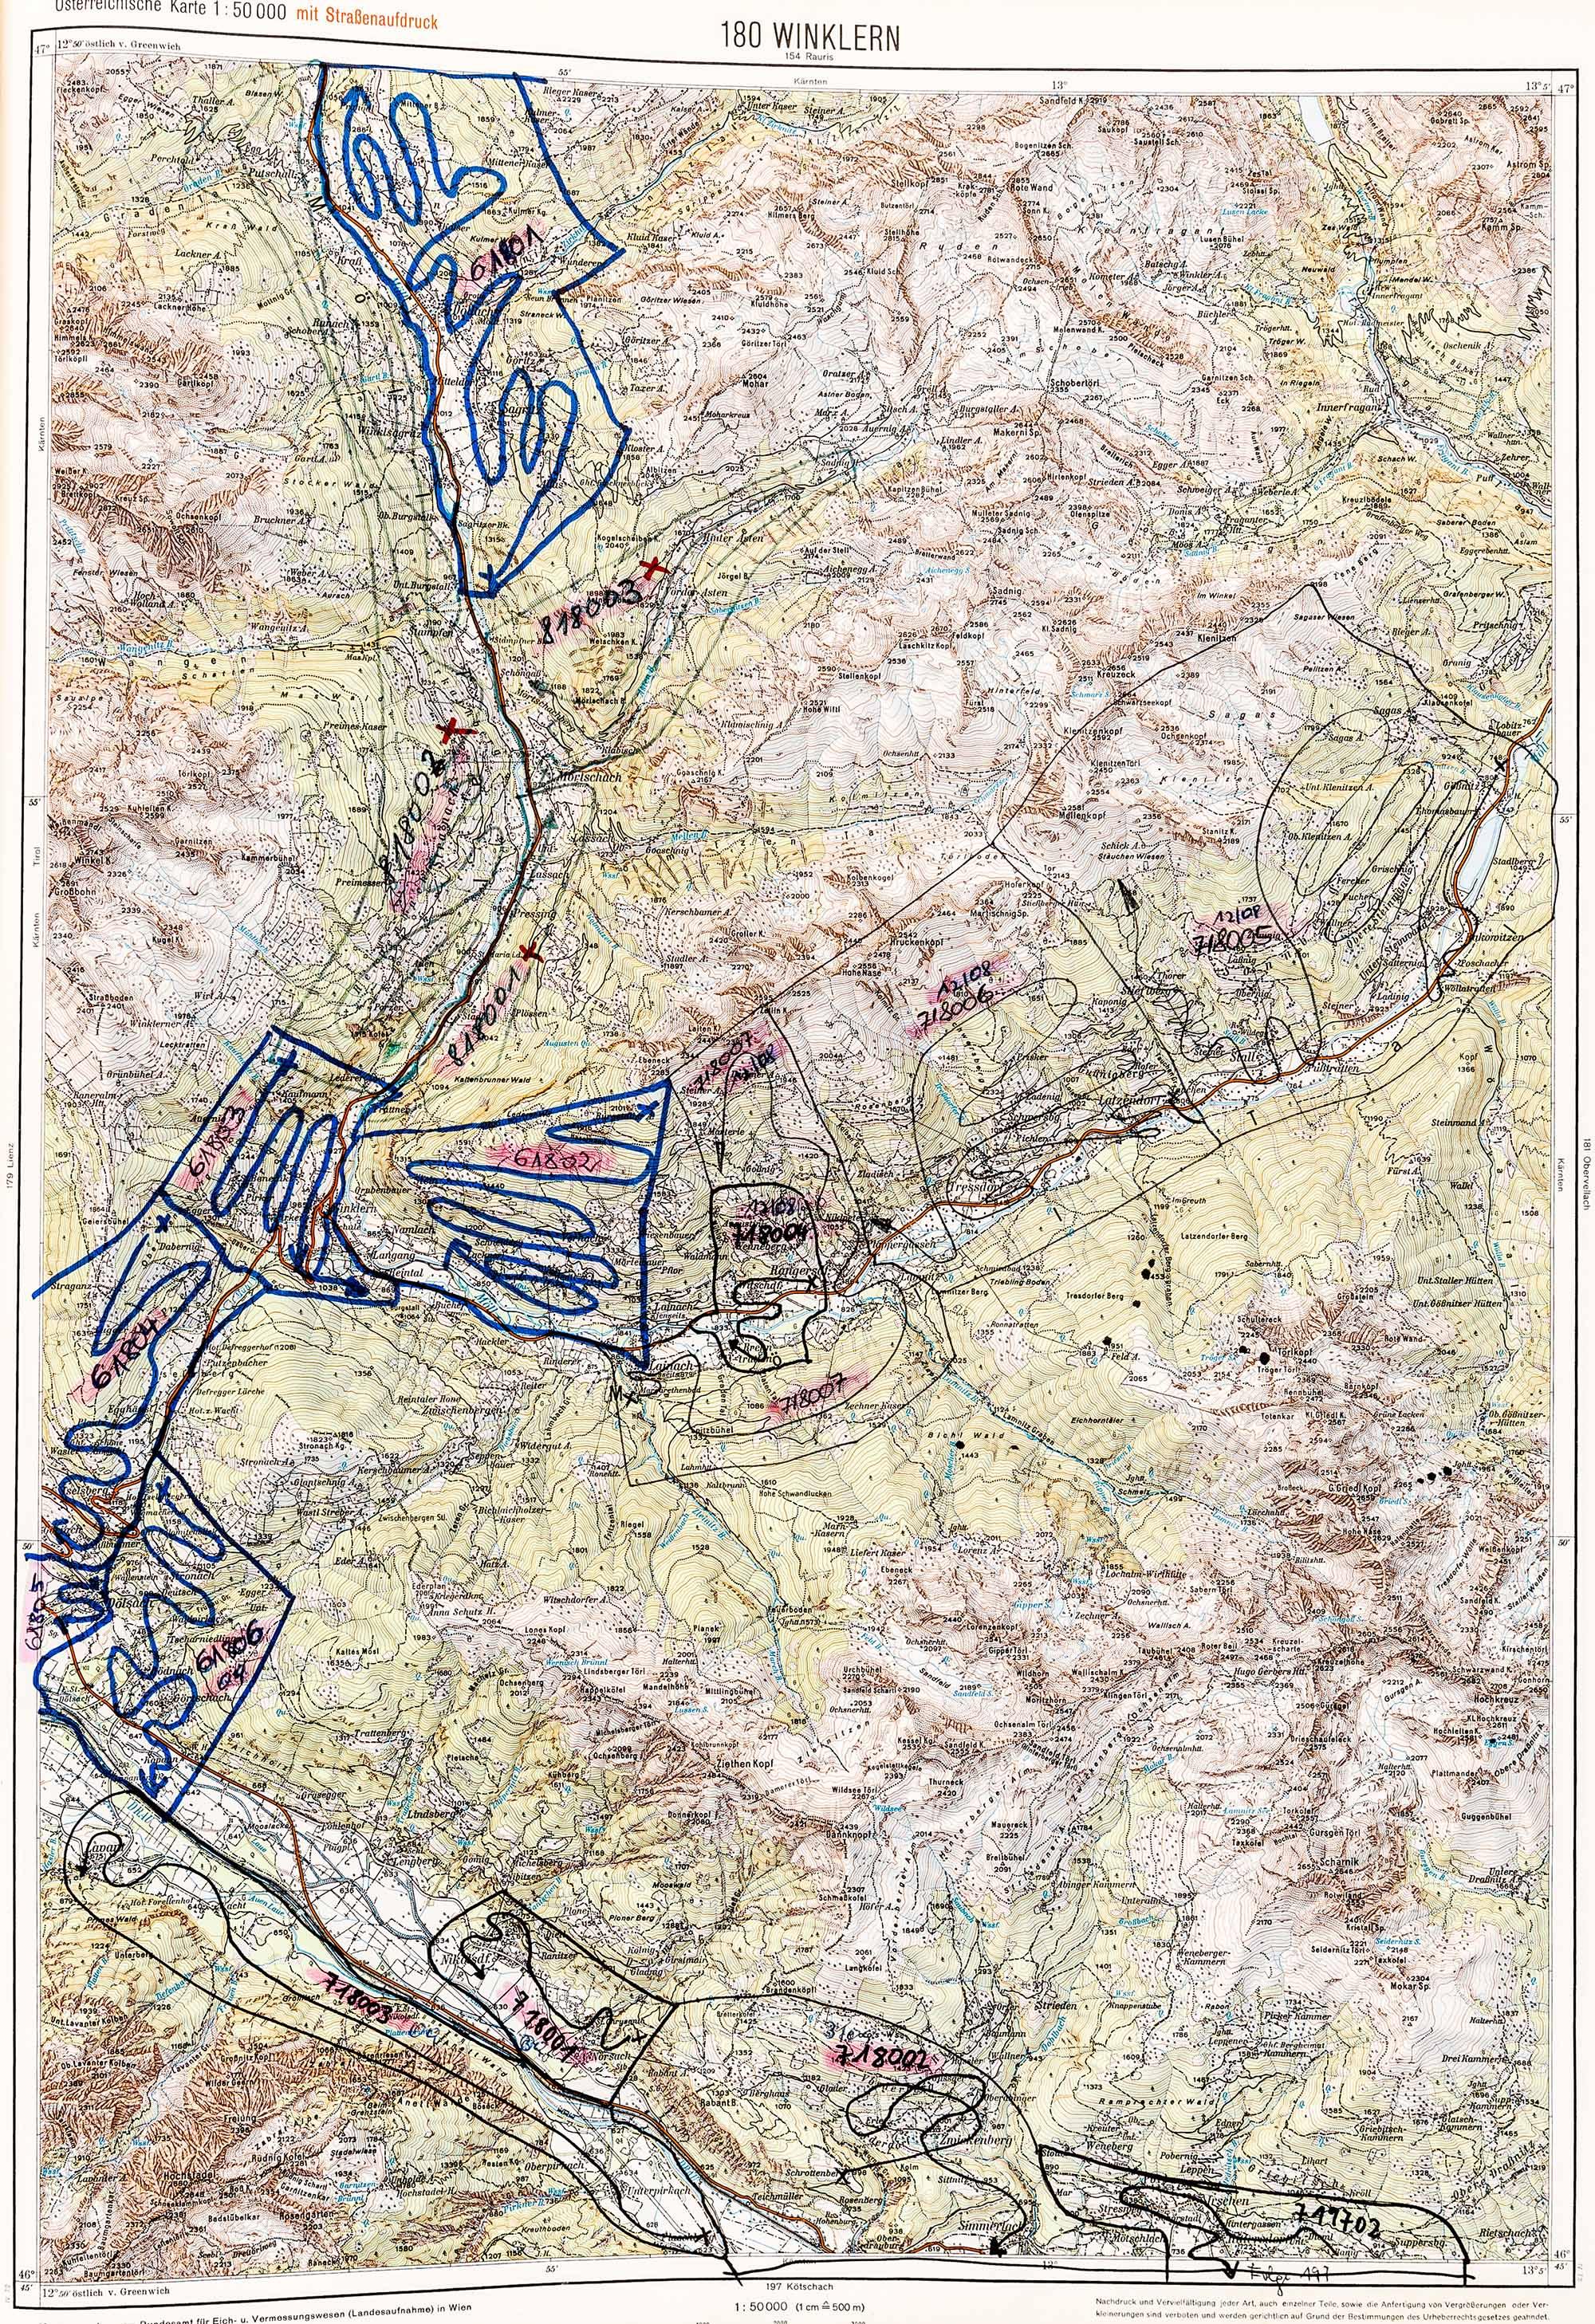 1975-1979 Karte 180